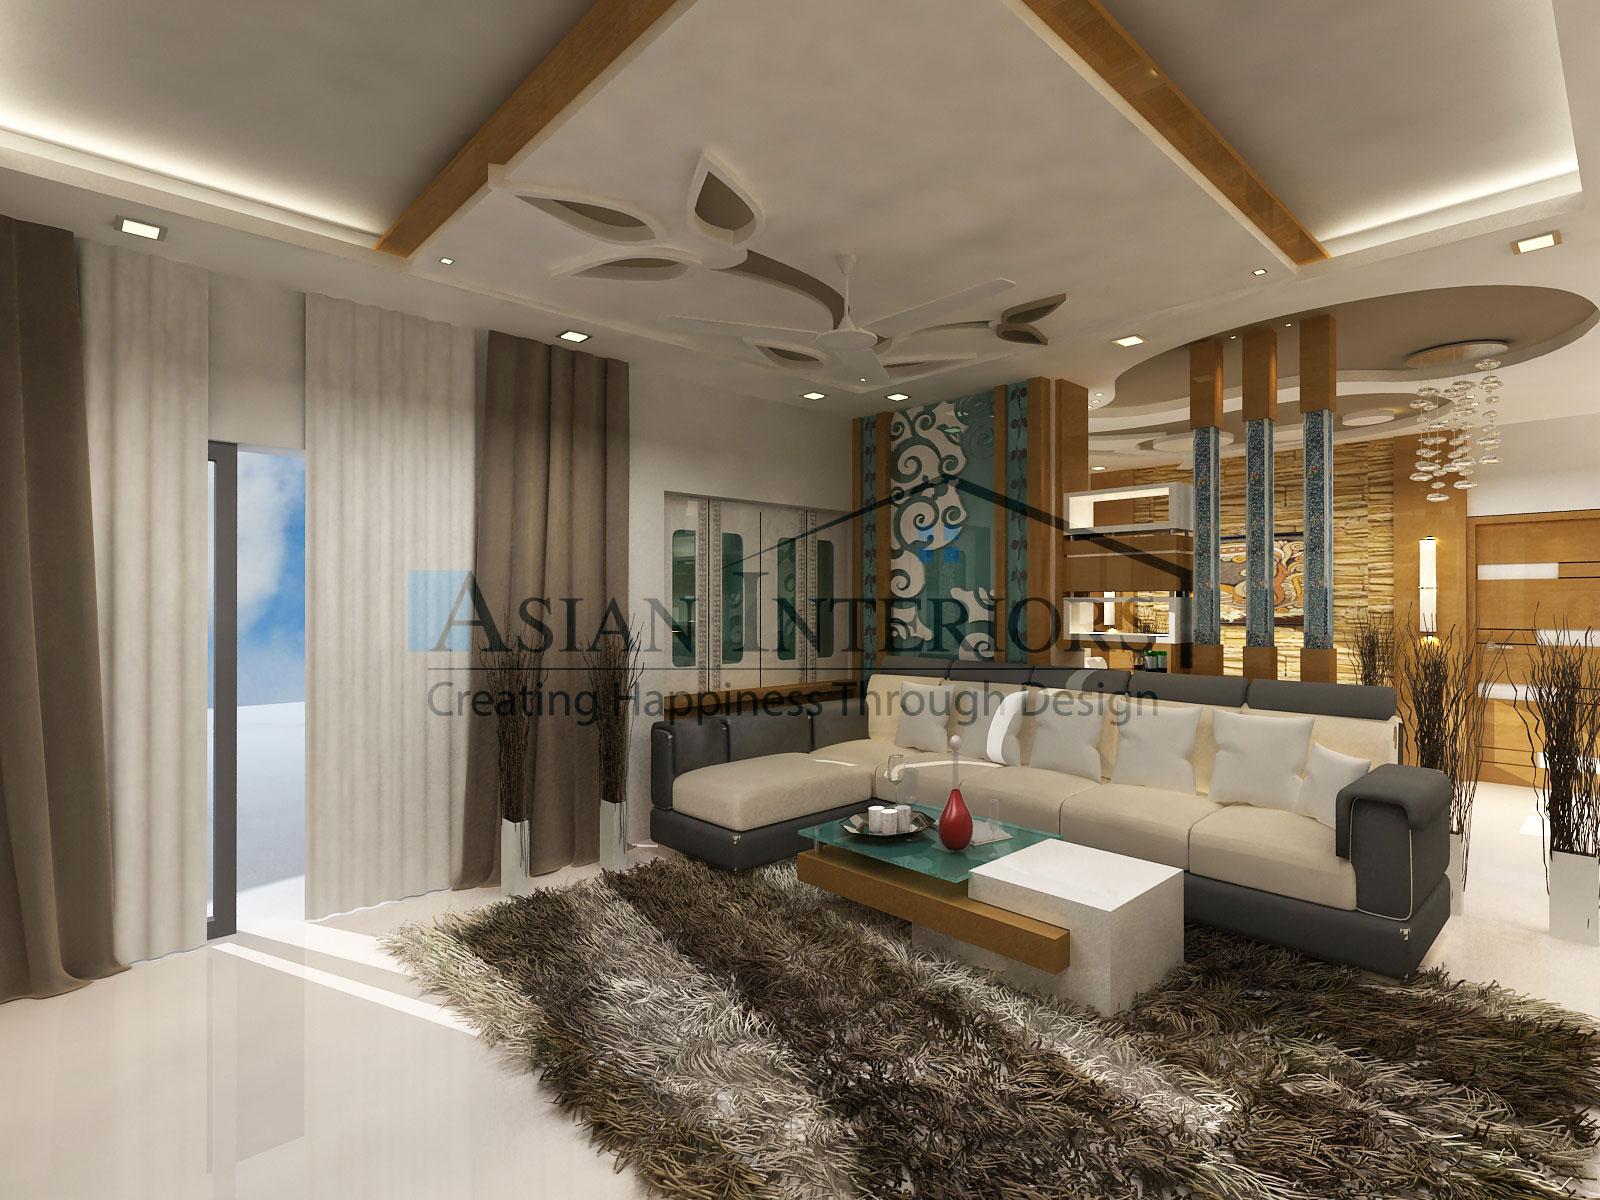 Asian-Interiors-DrawingRoom22